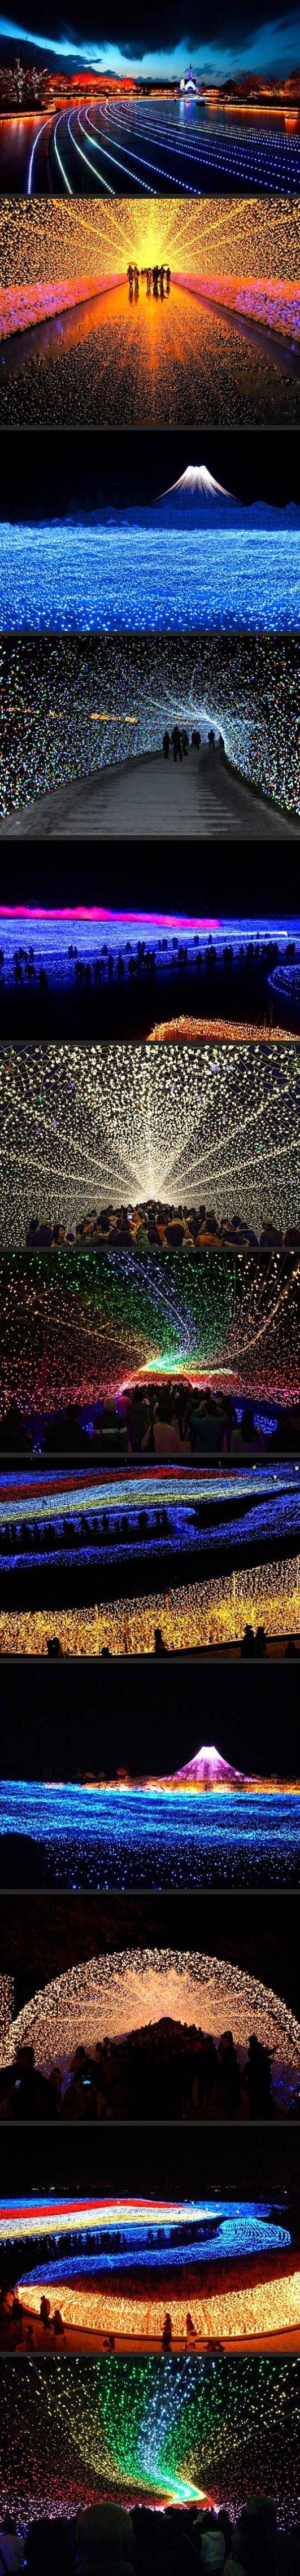 Japans Winter Lights Festival https://www.facebook.com/ouiliviamoraes https://www.liviamoraes.com.br